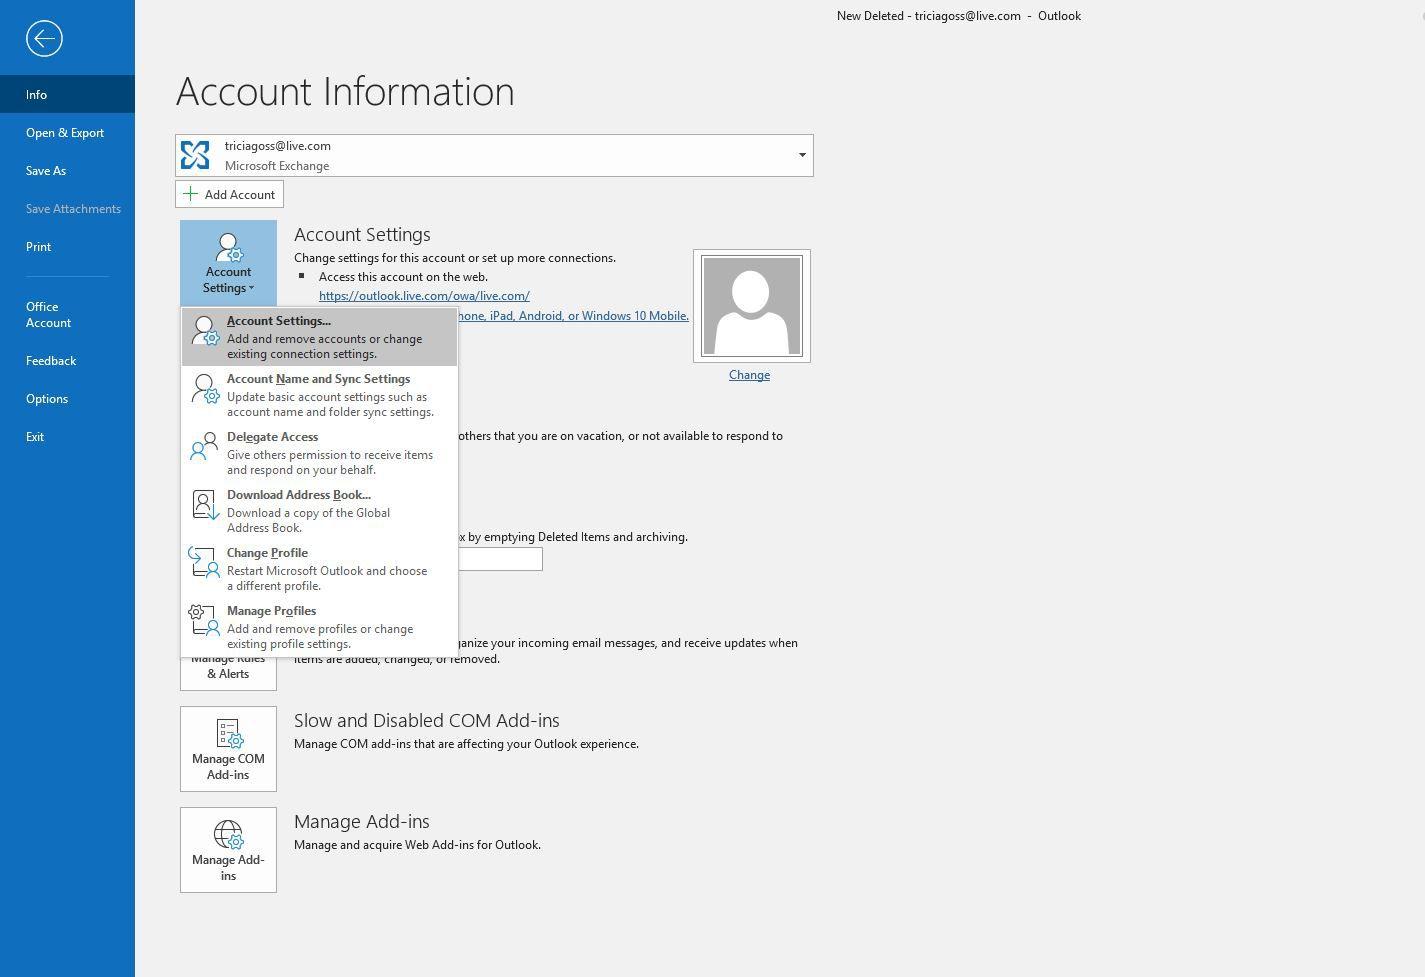 Screenshot of Account Settings